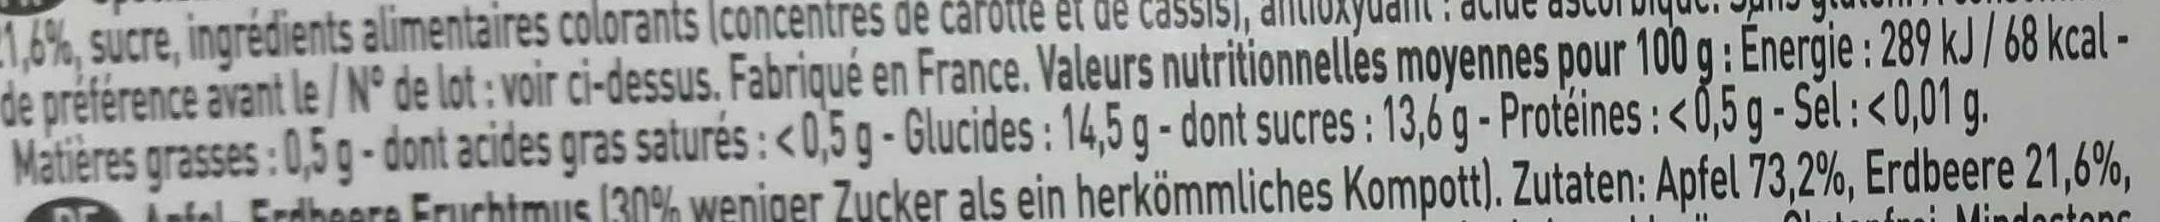 Pomme Fraise - Voedingswaarden